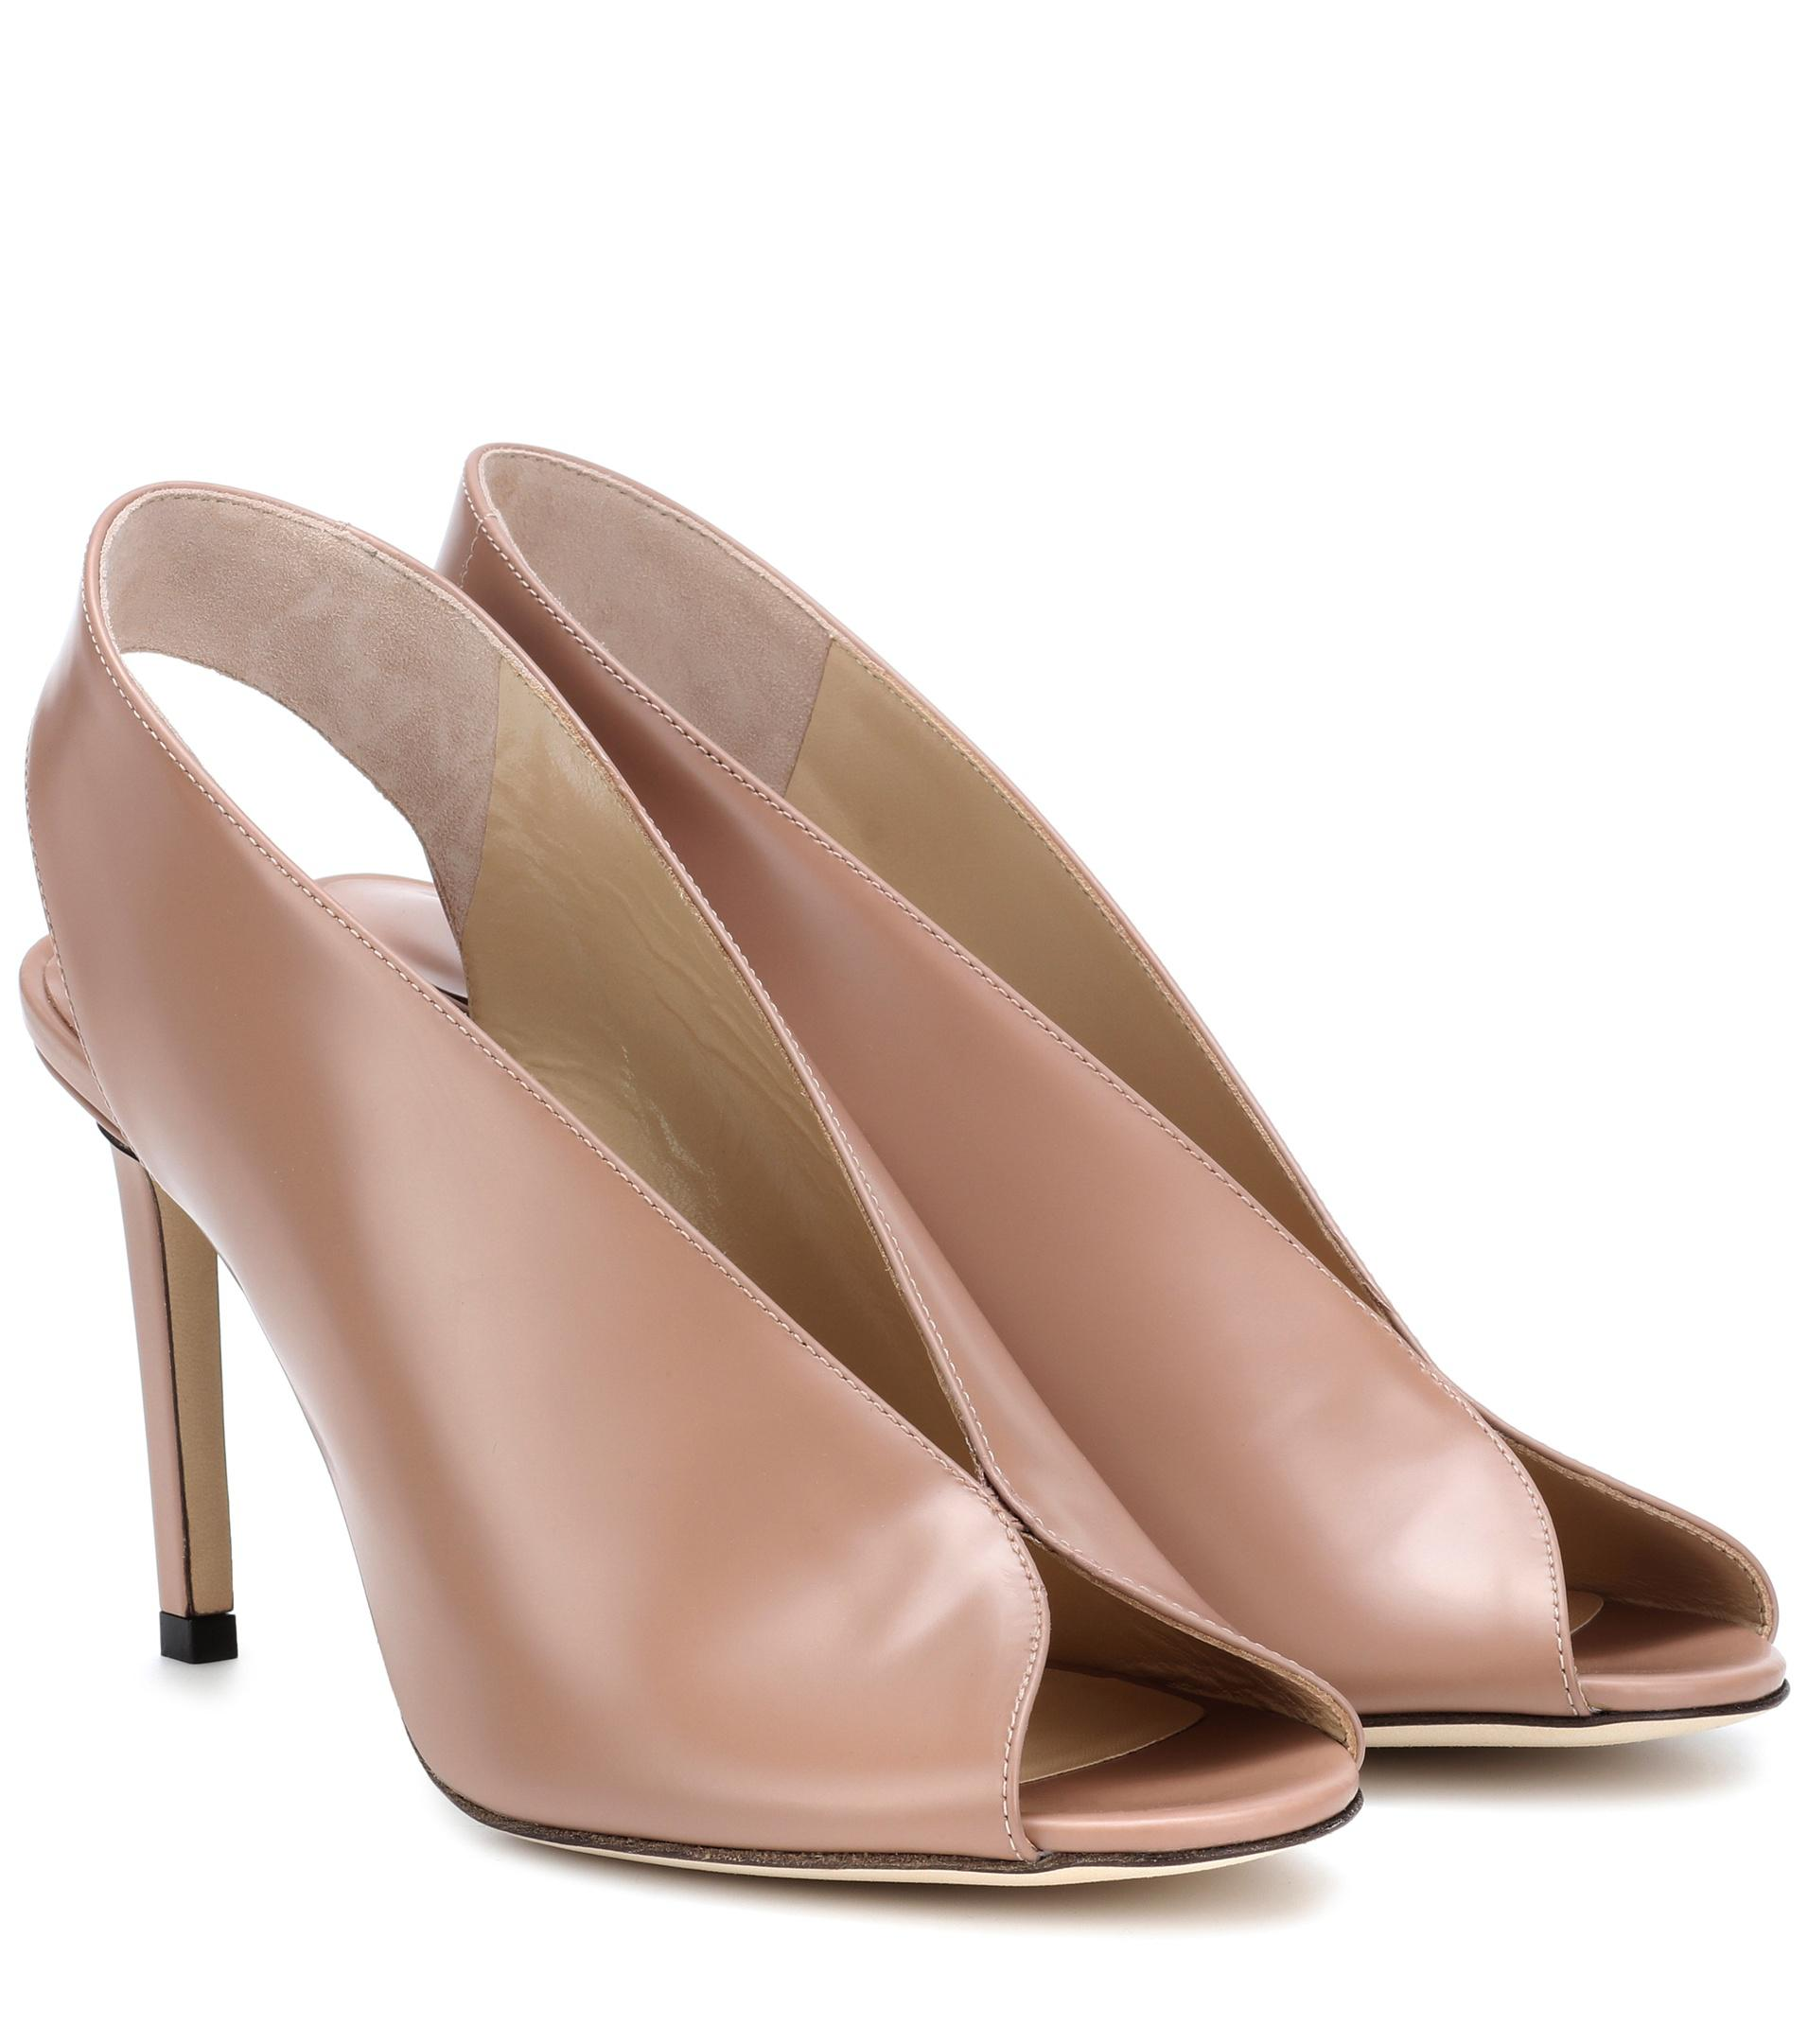 Jimmy choo Shar 85 suede sandals 7PFULpKY